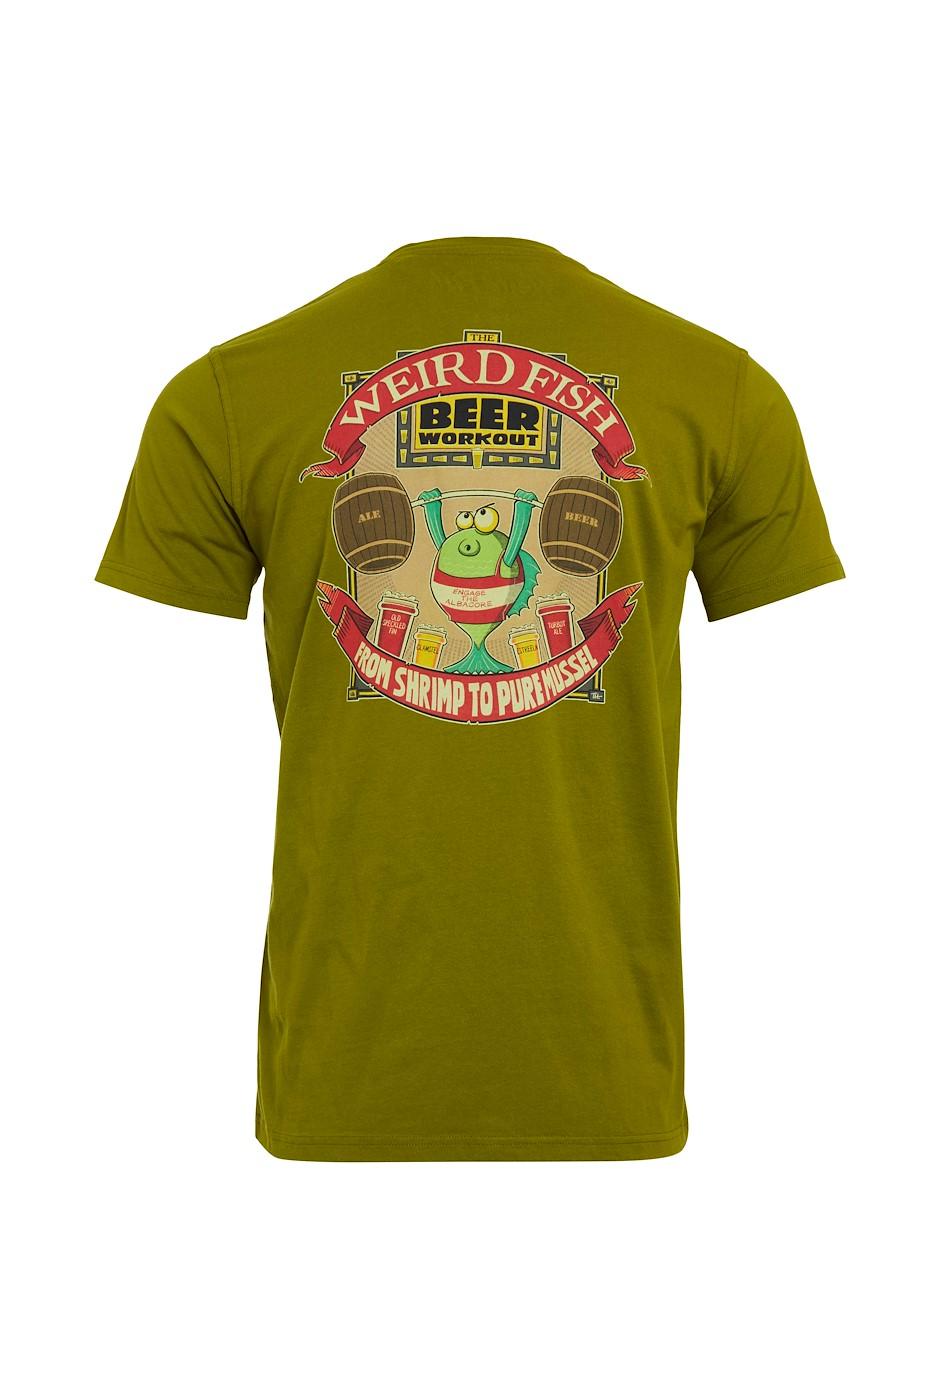 Pure Mussel Organic Cotton Artist T-Shirt Woodbine